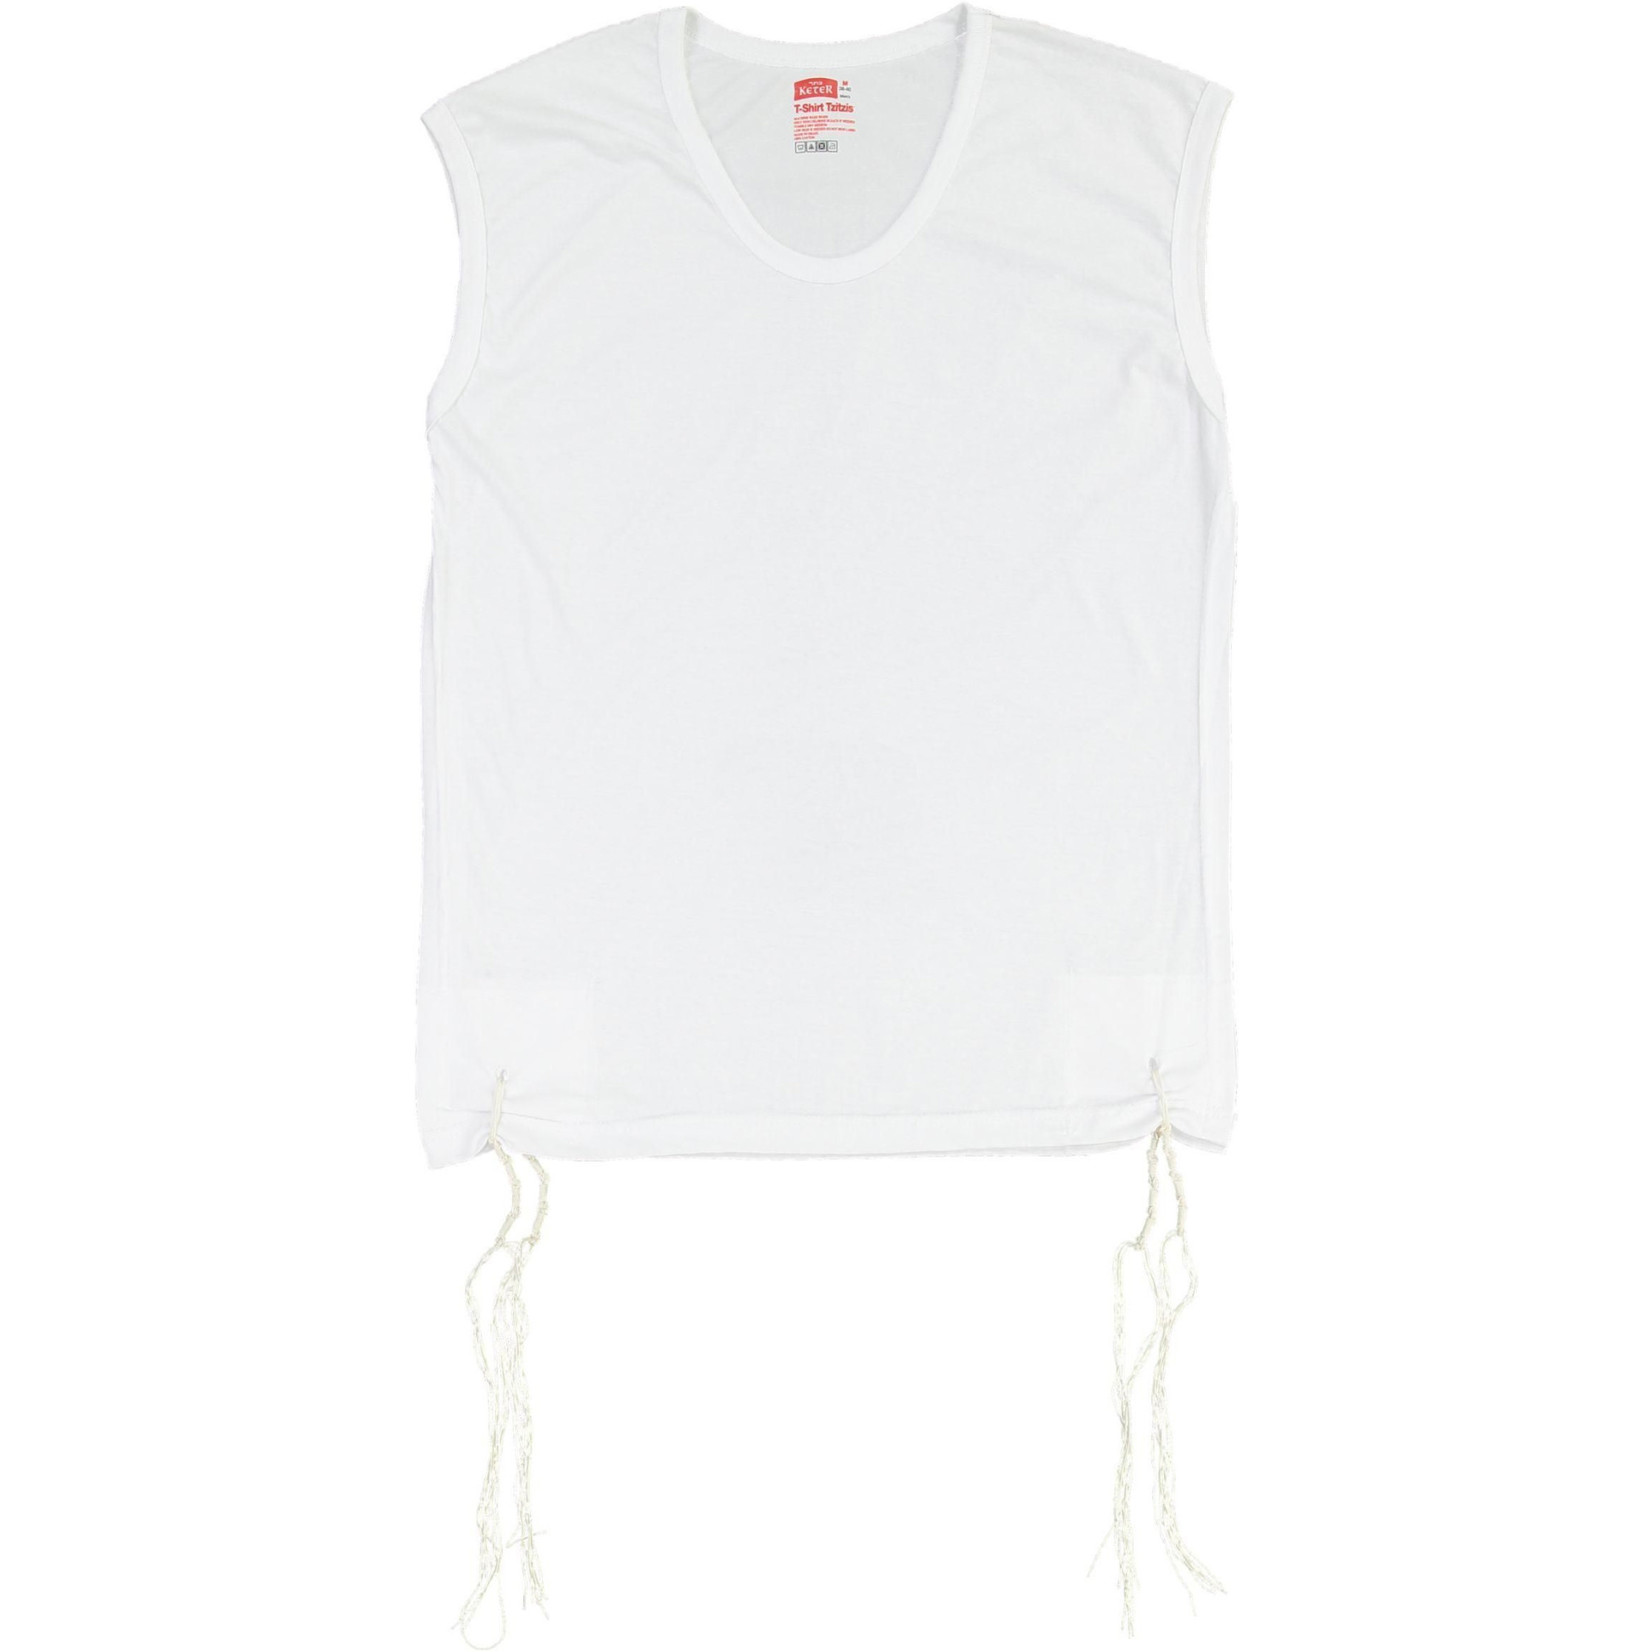 Undershirt-Style Arbah Kanfot, 100% Cotton, Round Neck, Size S